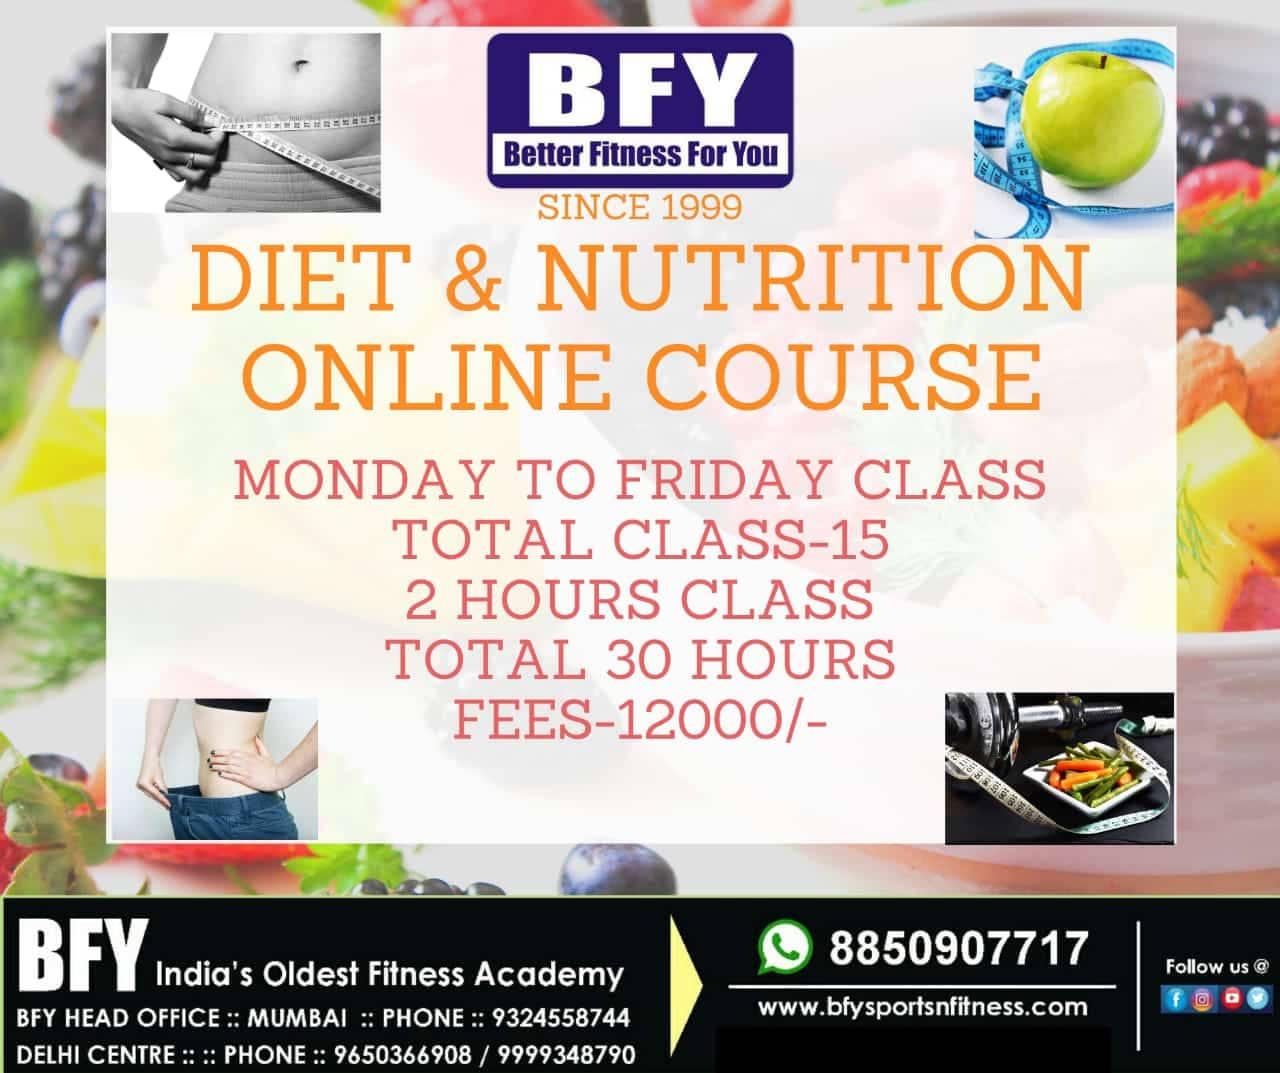 Diet & Nutrition Online Course